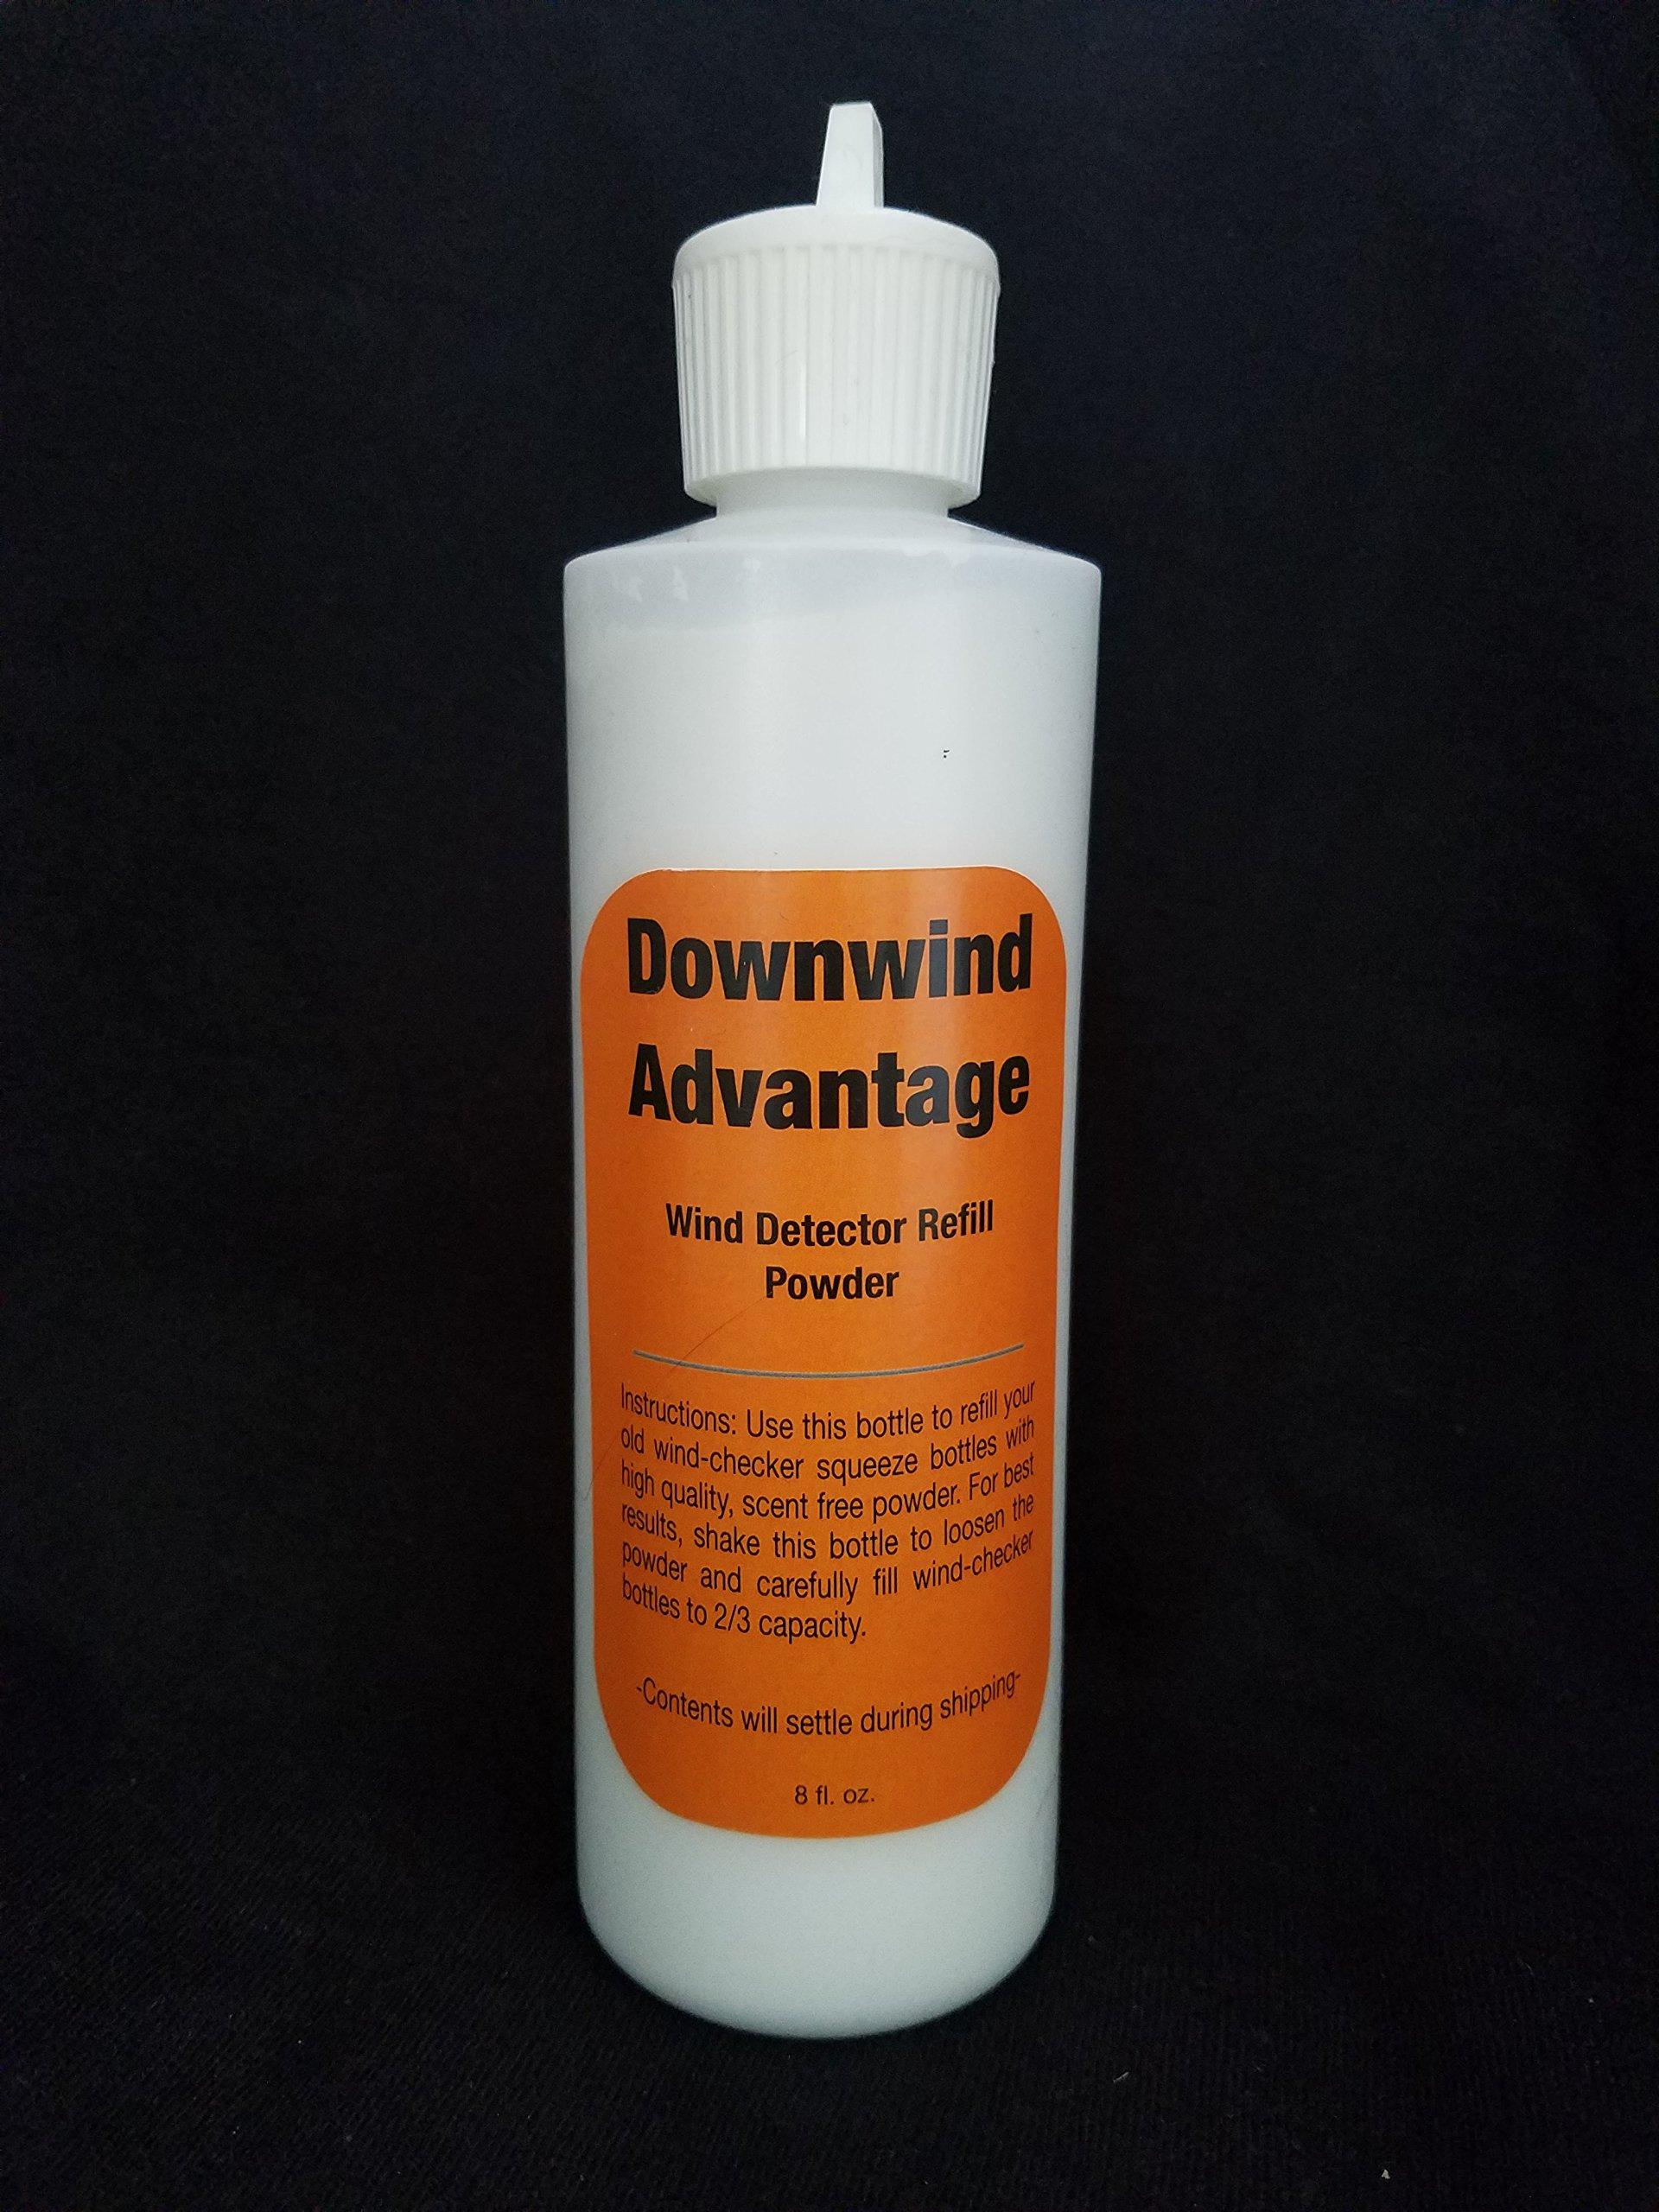 Wind Direction Detector Refill Powder - Wind